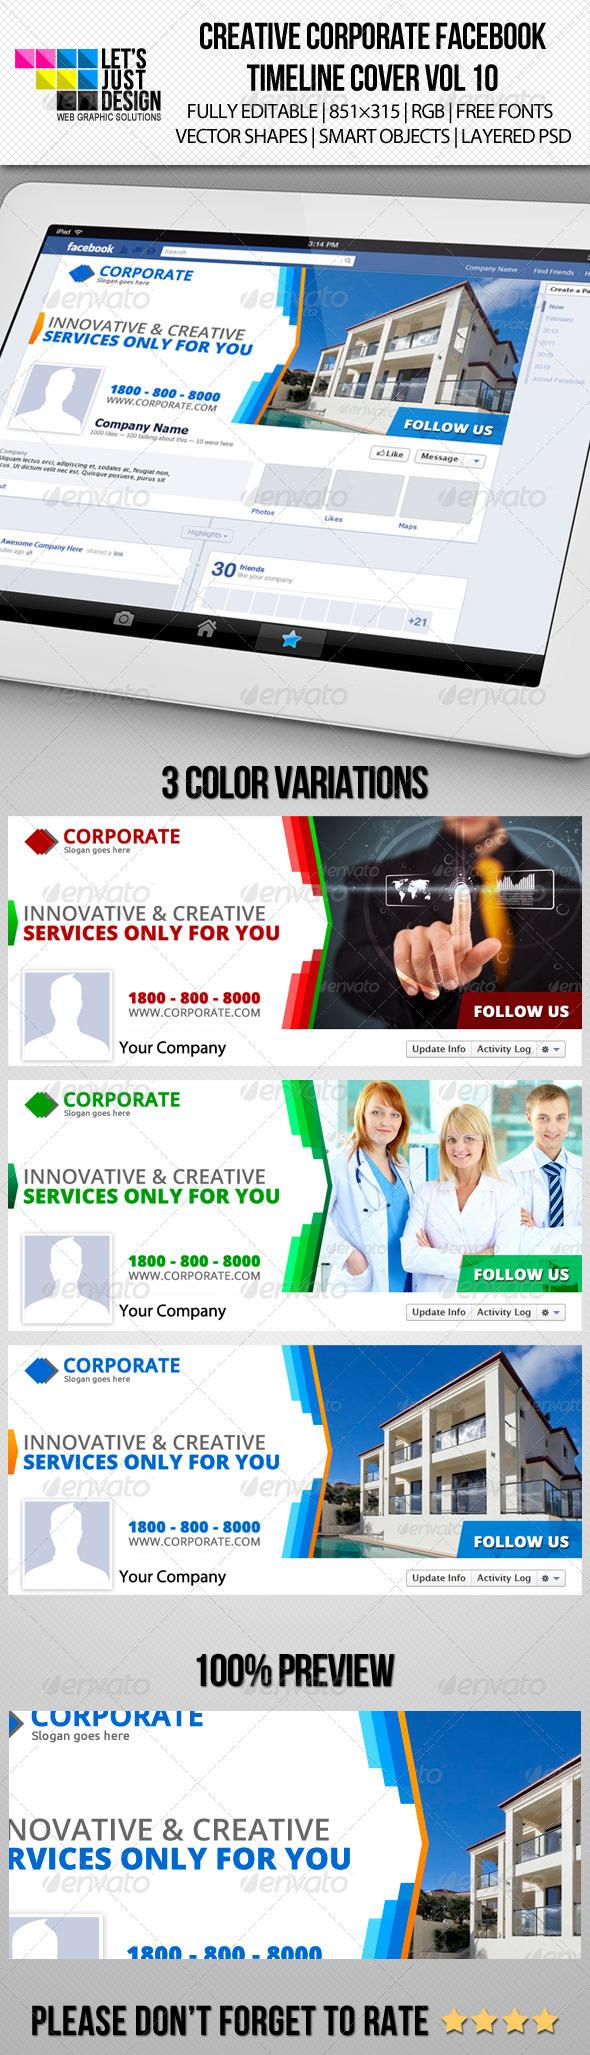 Creative Corporate Facebook Timeline Cover Vol 10 - Facebook Timeline Covers Social Media